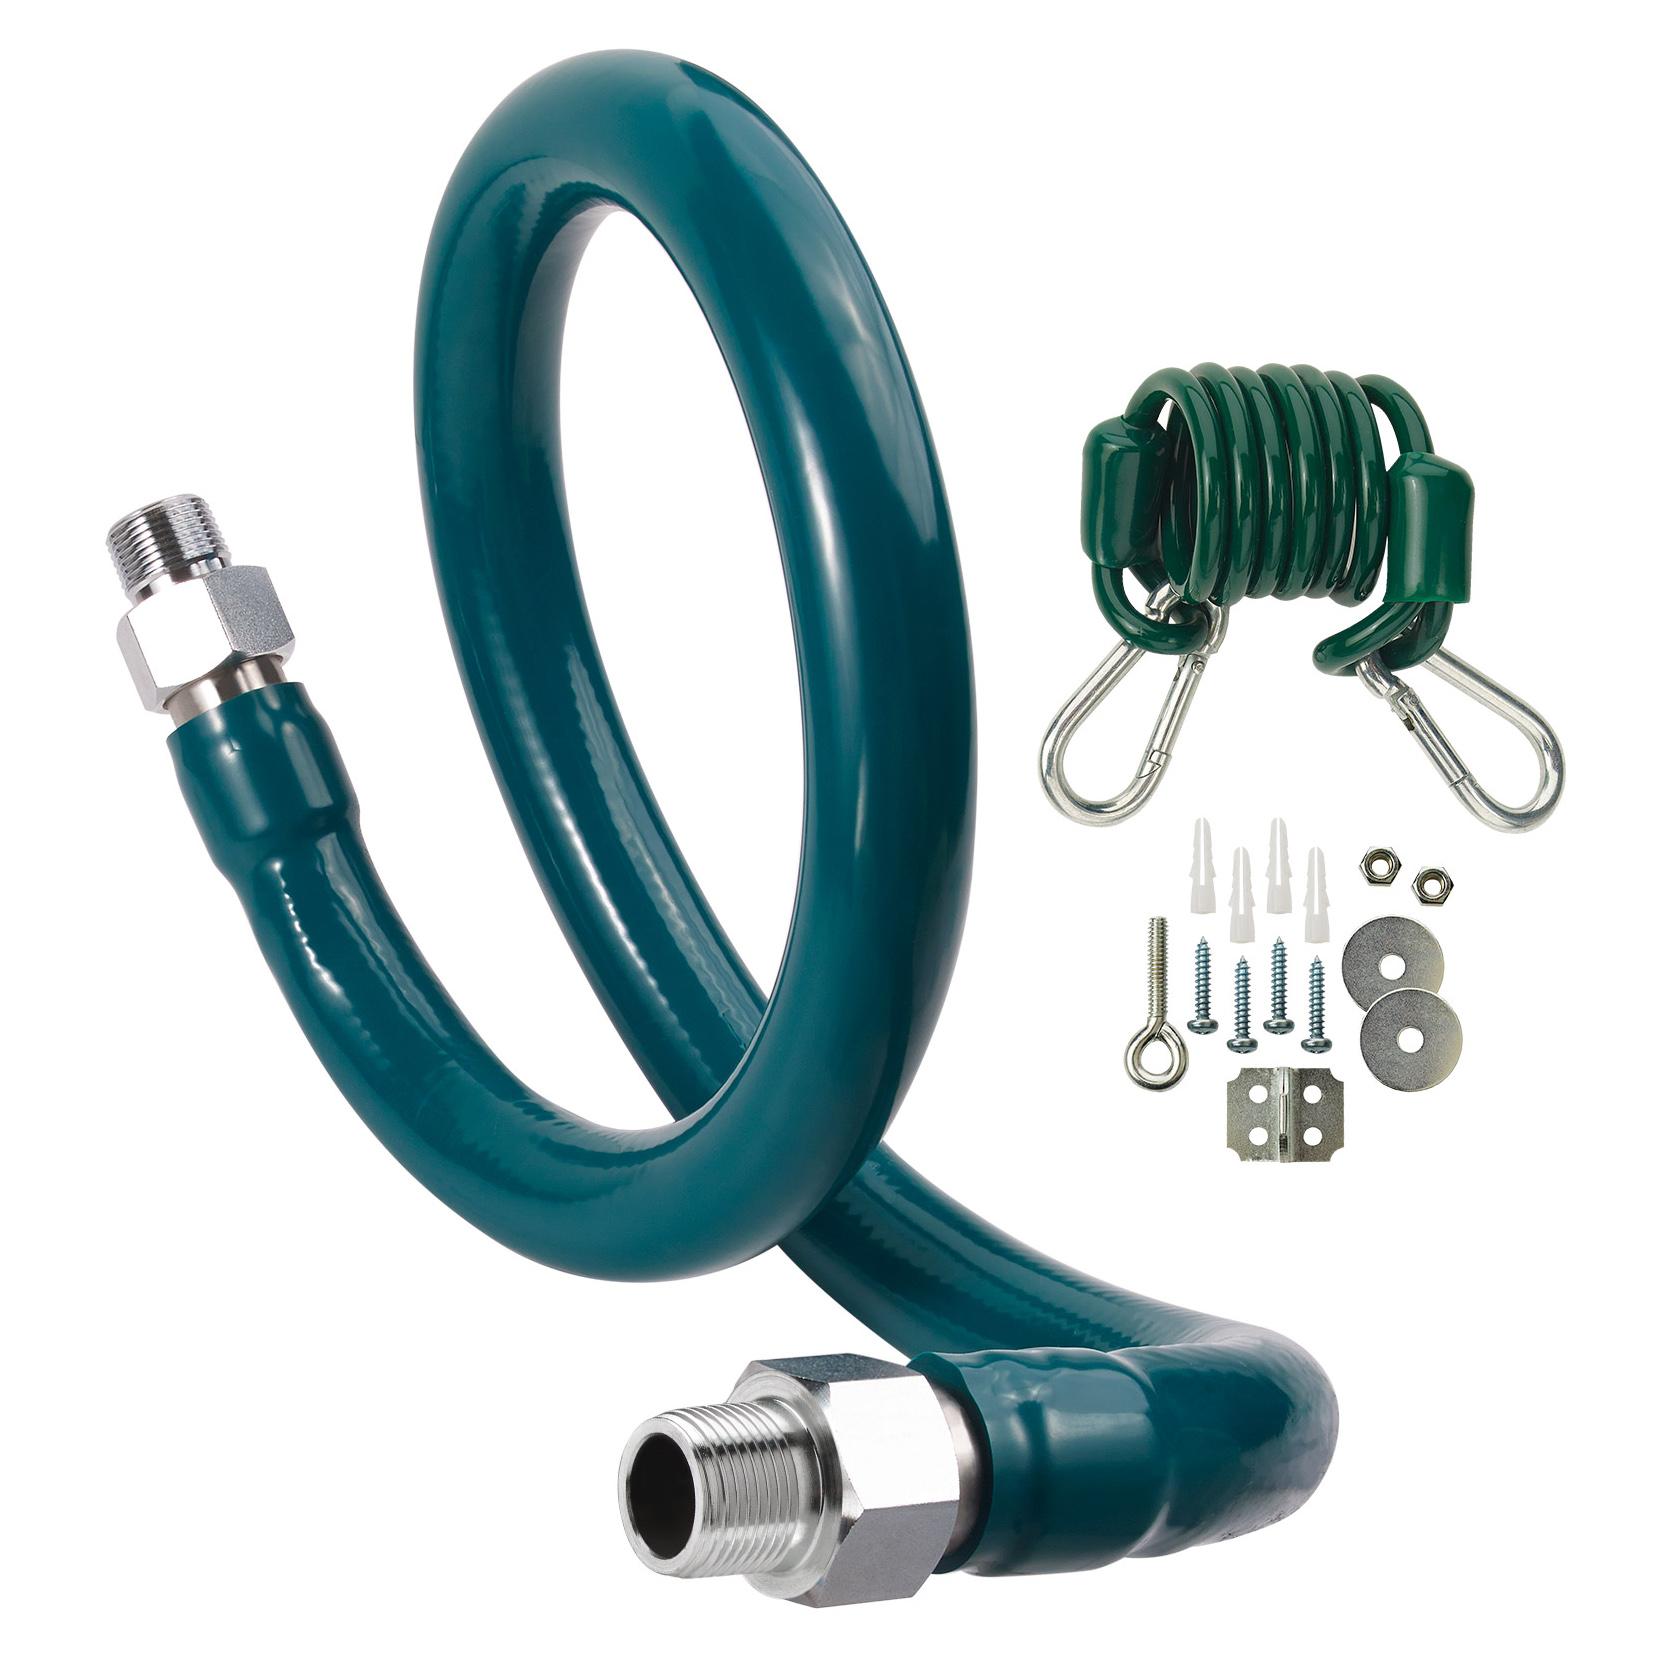 Krowne Metal M5024K6 gas connector hose kit